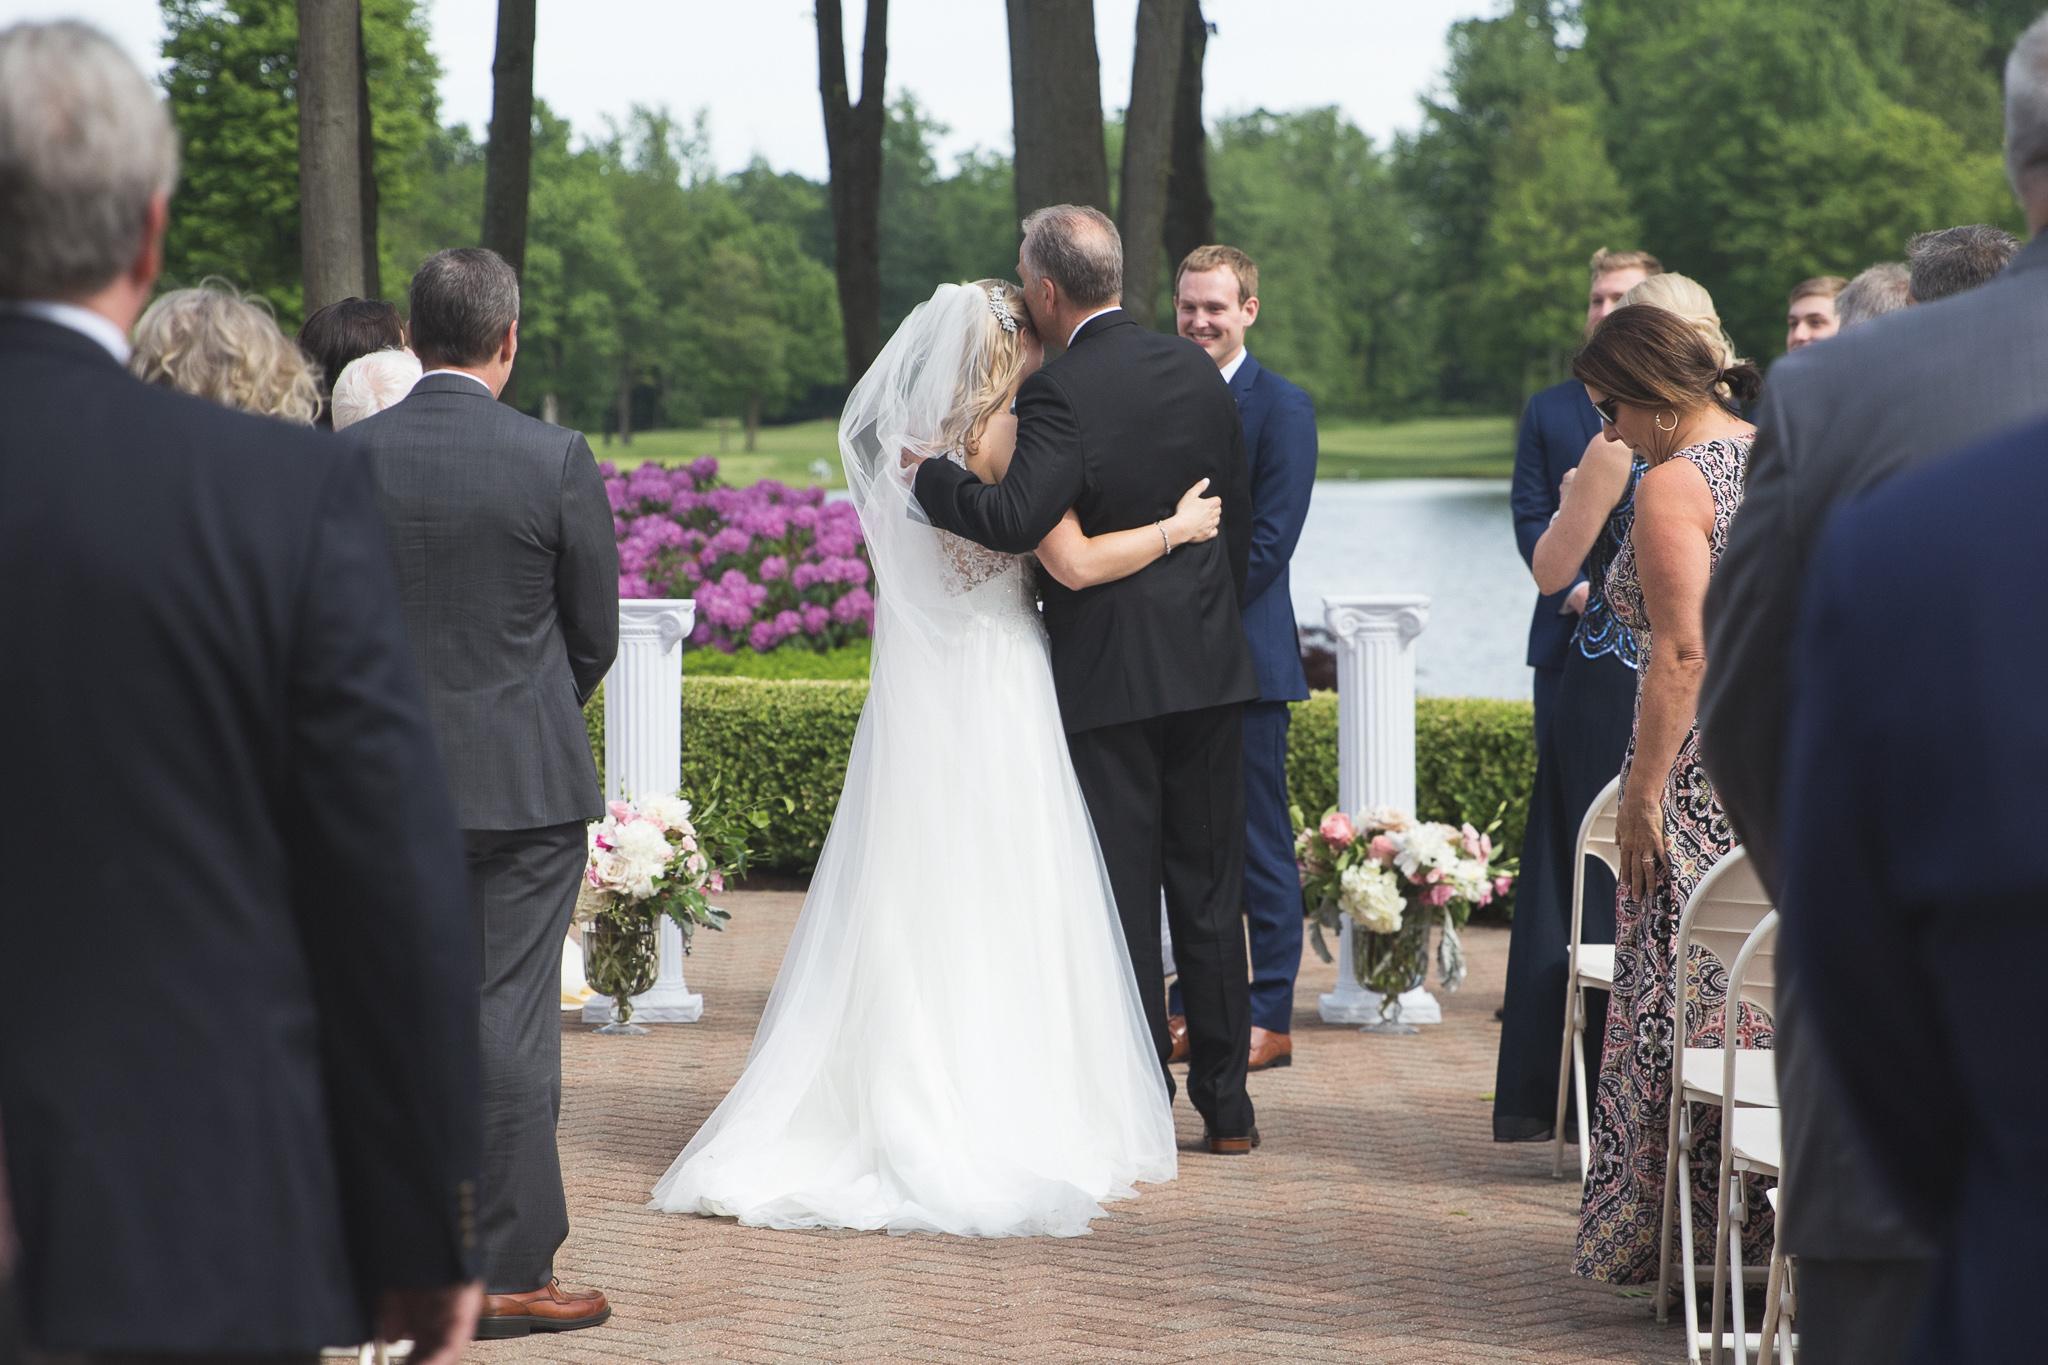 079-best-detroit-michigan-outdoor-wedding-photographer.jpg